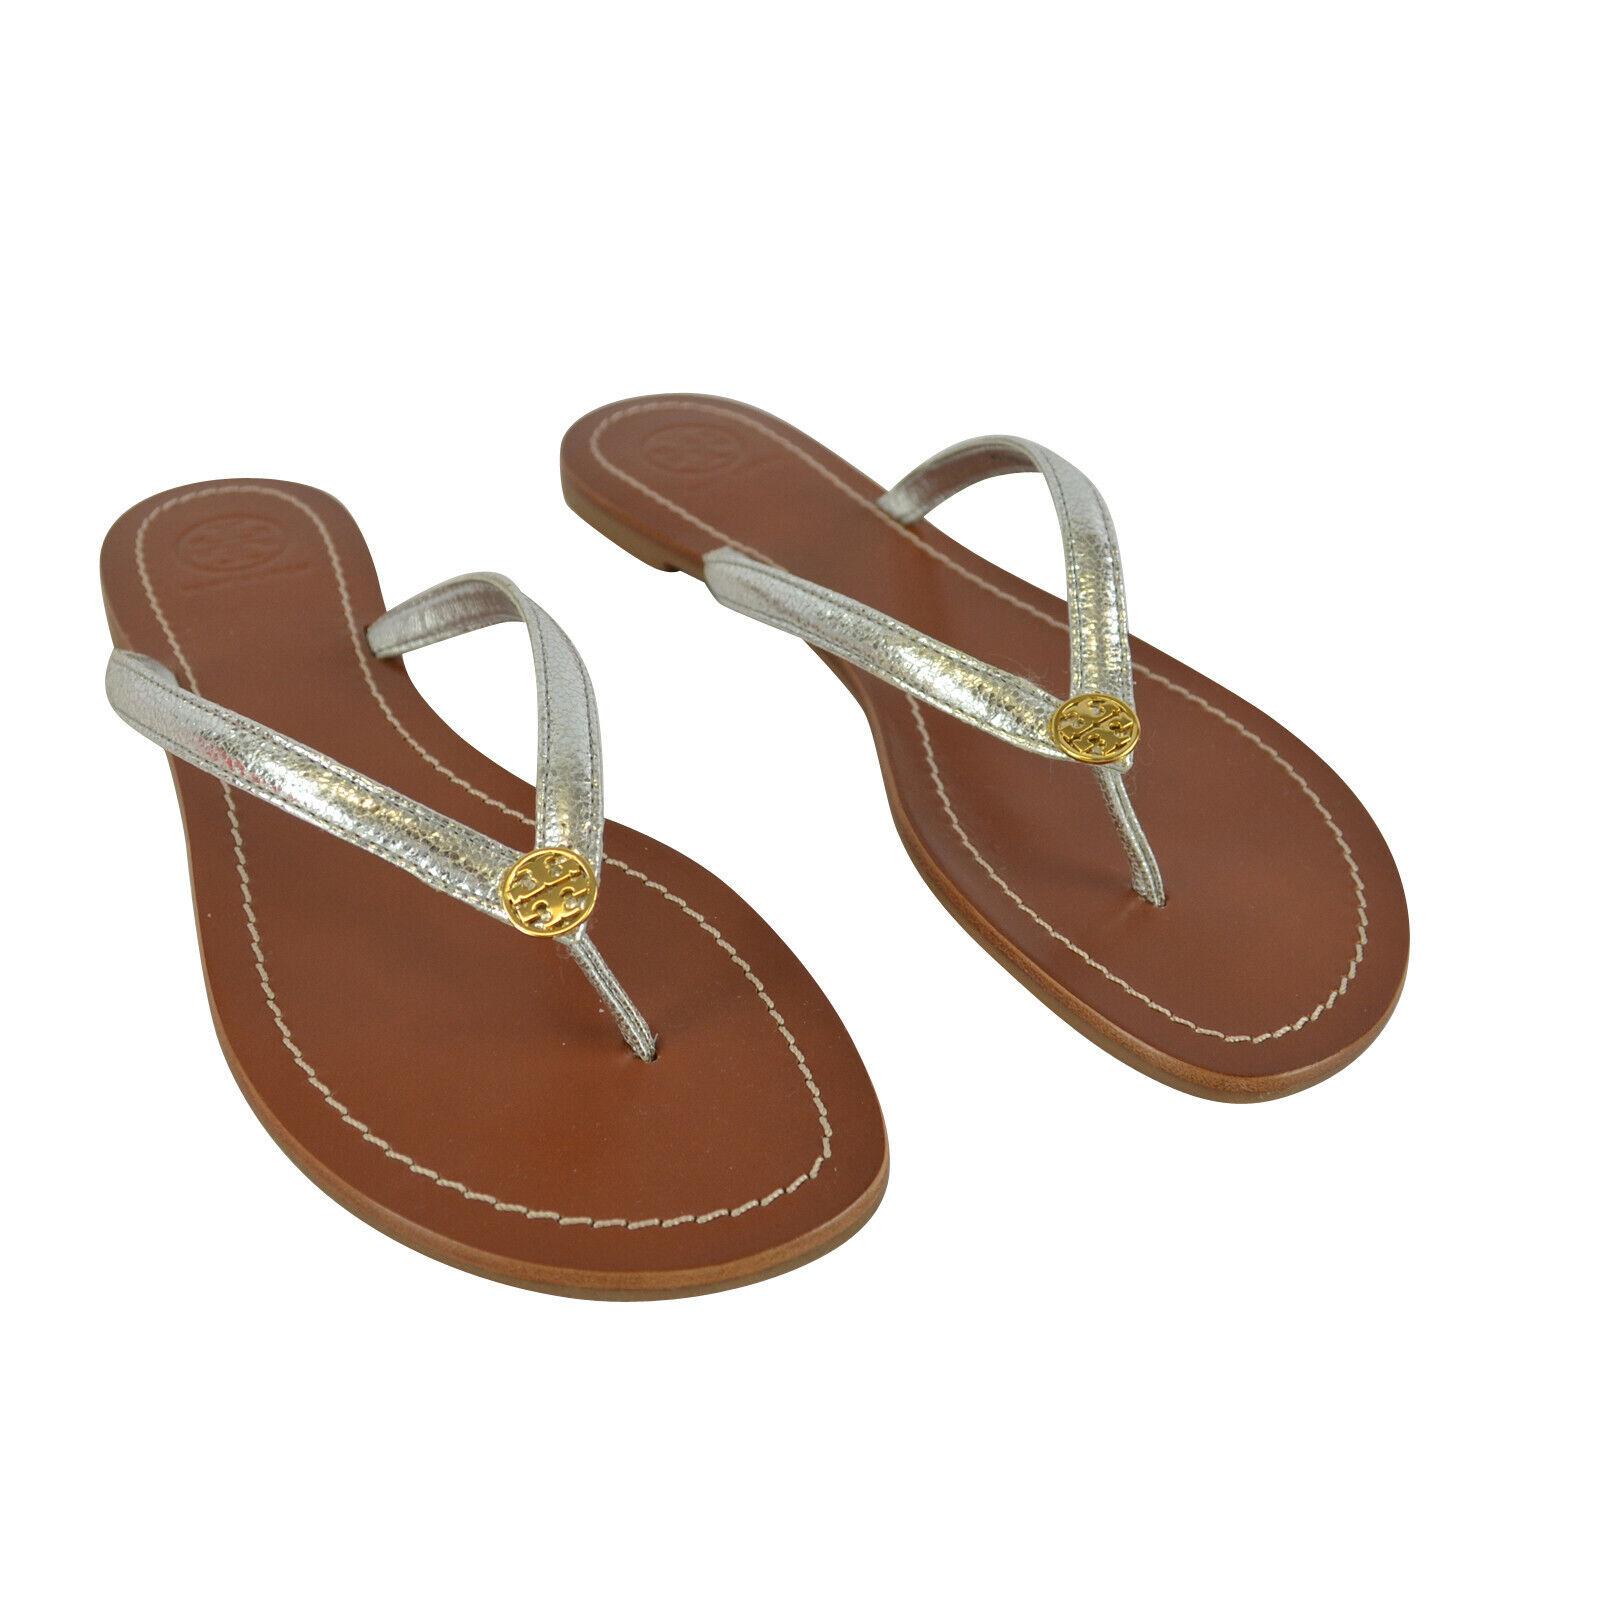 Terra Thong Sandals Metallic Silver